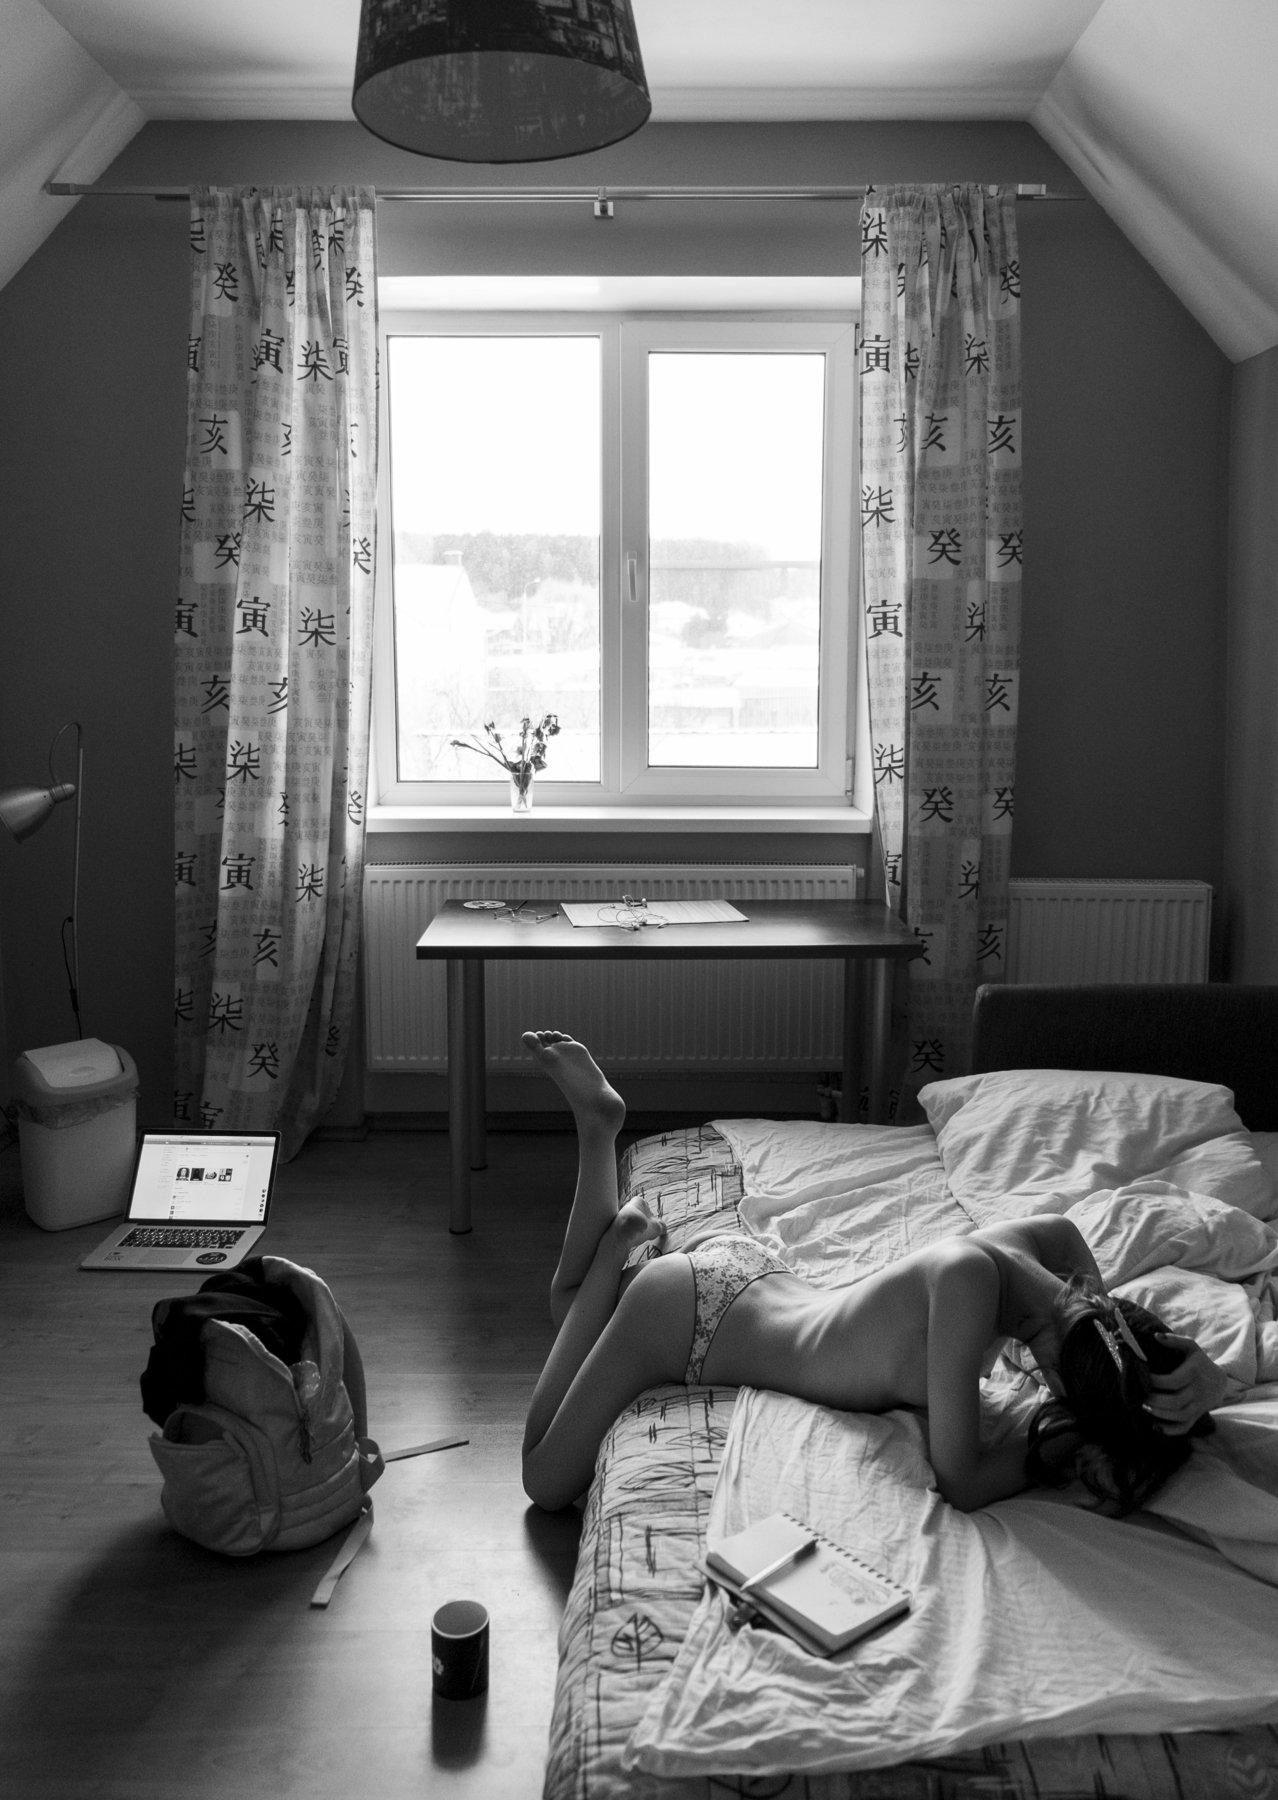 girl, nude, home, b&w, black and white, at home, moscow, village, yamontovo, fujifilmru, Роман Филиппов